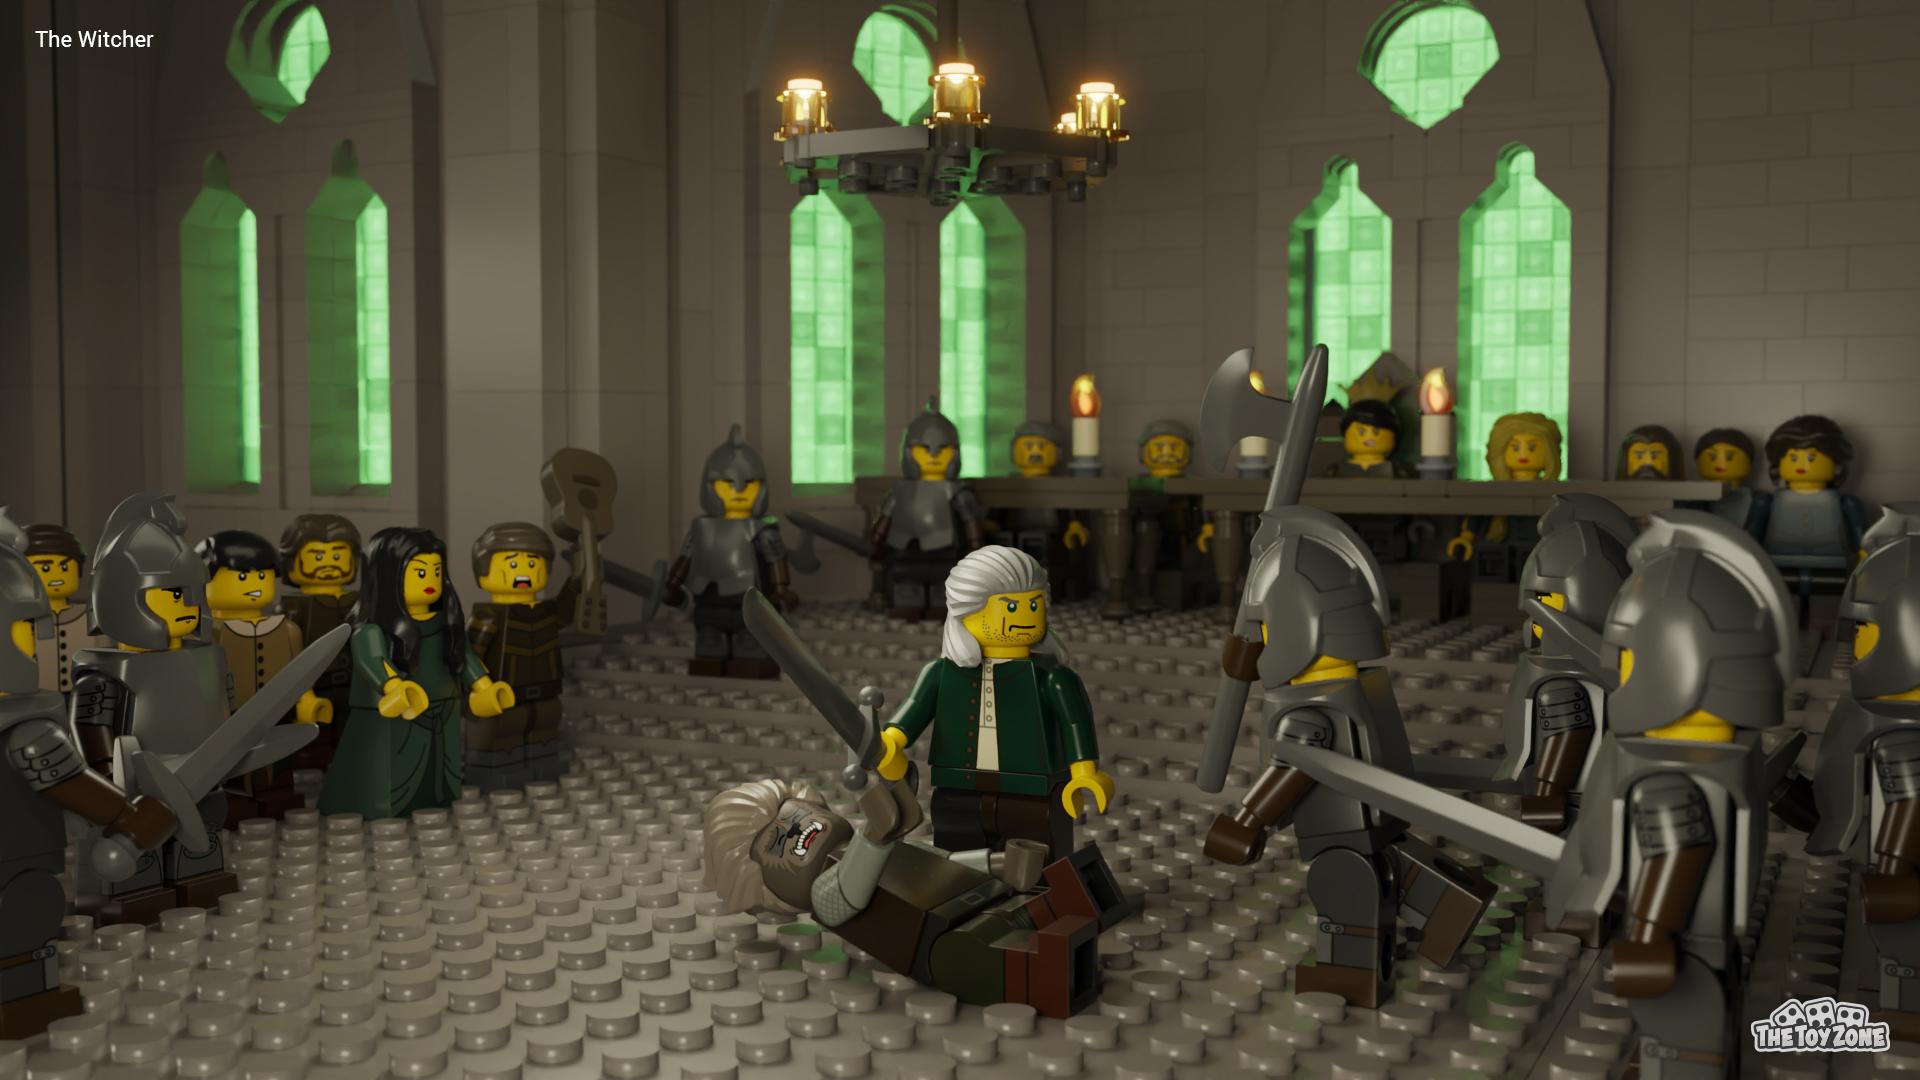 8 Original Netflix Series Turned Into Incredible Lego Scenes